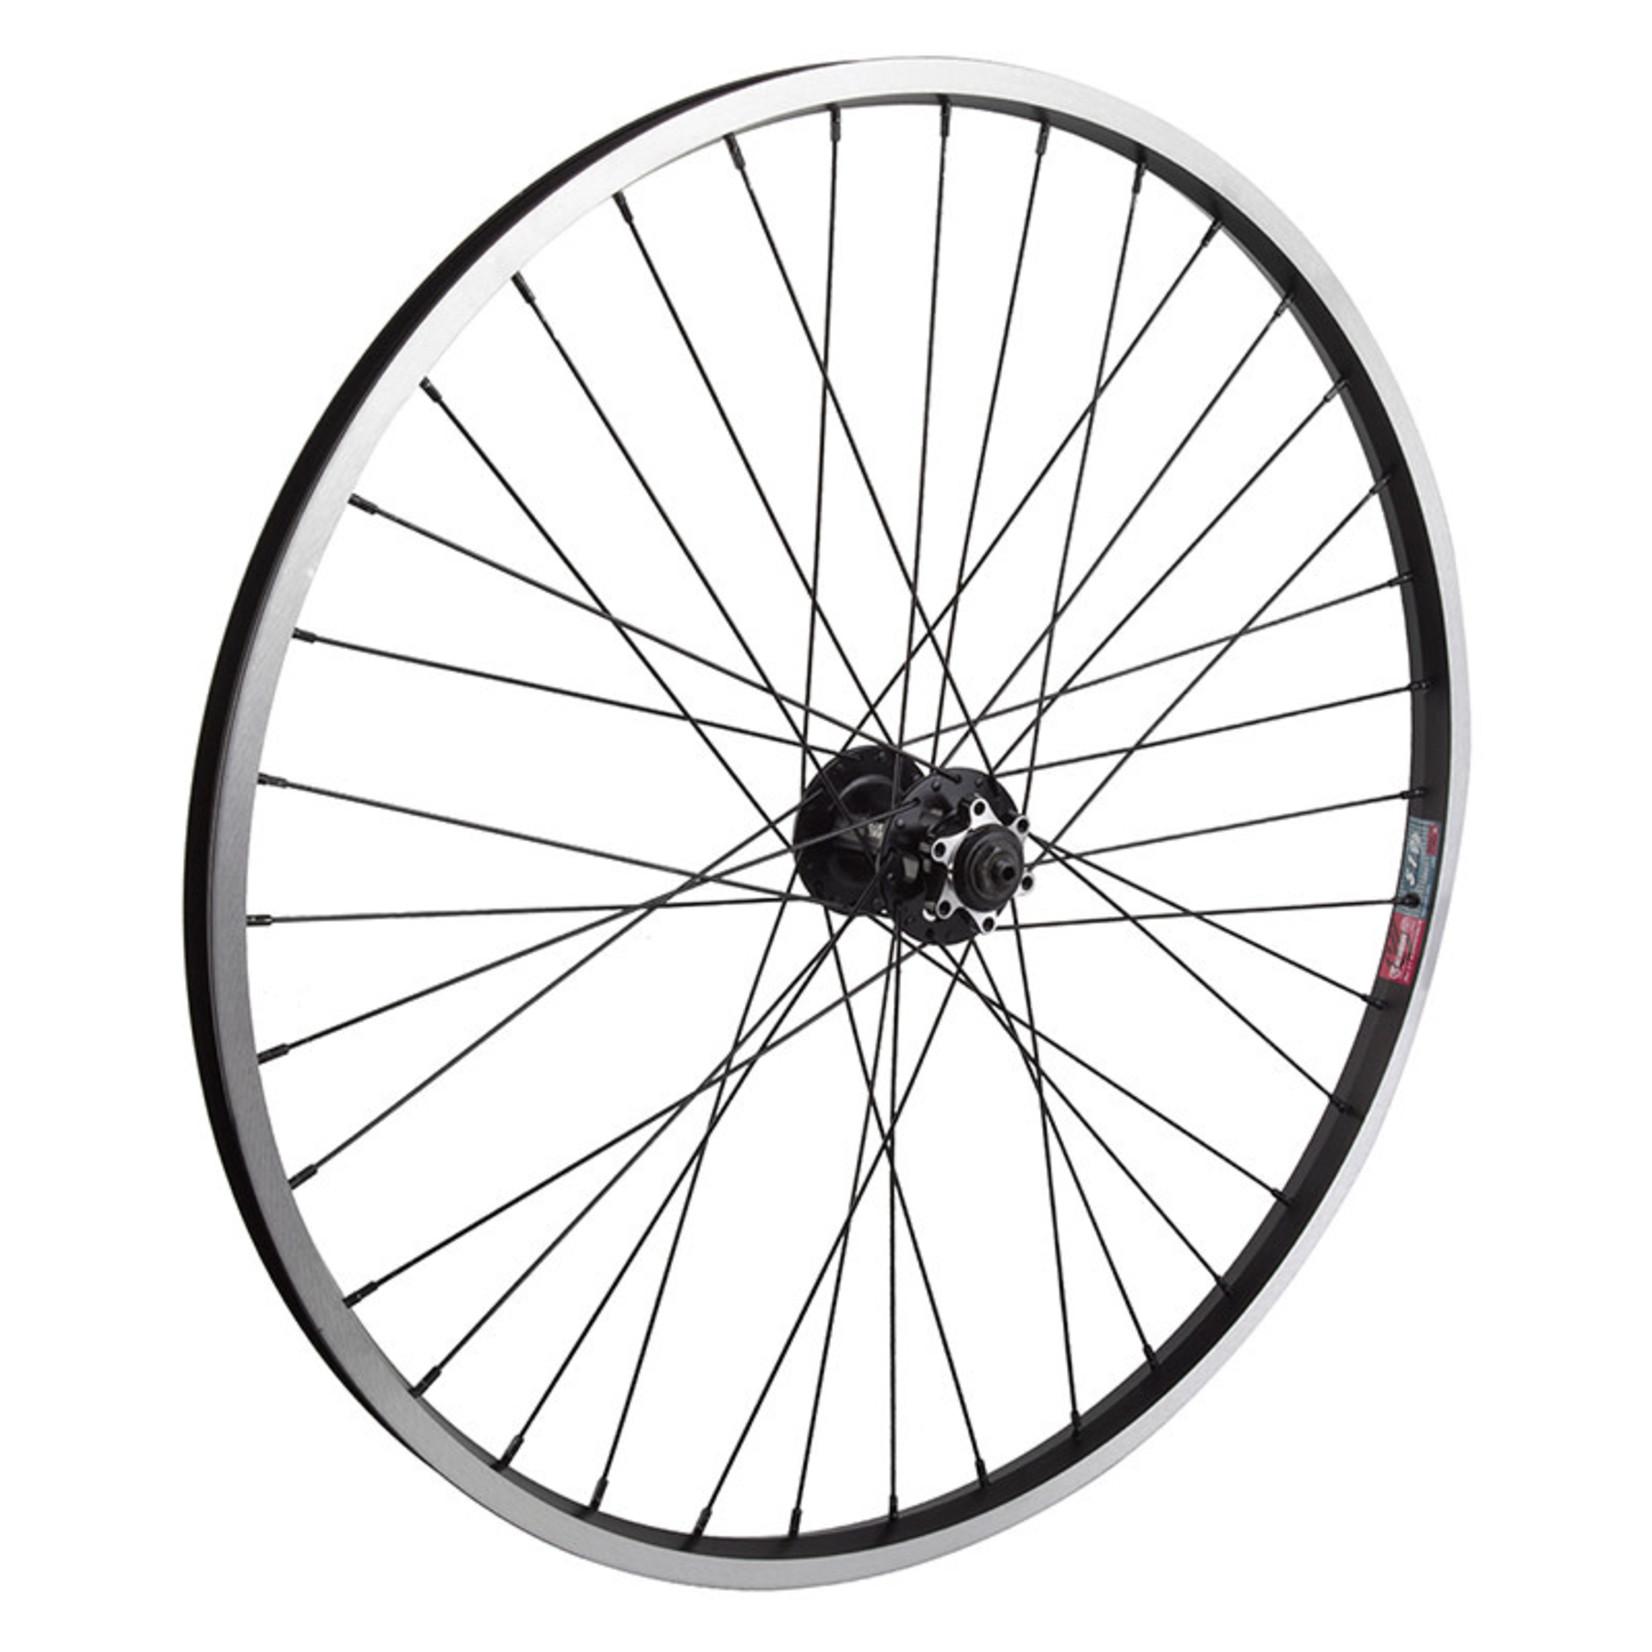 "26"" Front Wheel Alloy Mountain Disc Single Wall QR 14g Black w/MSW"